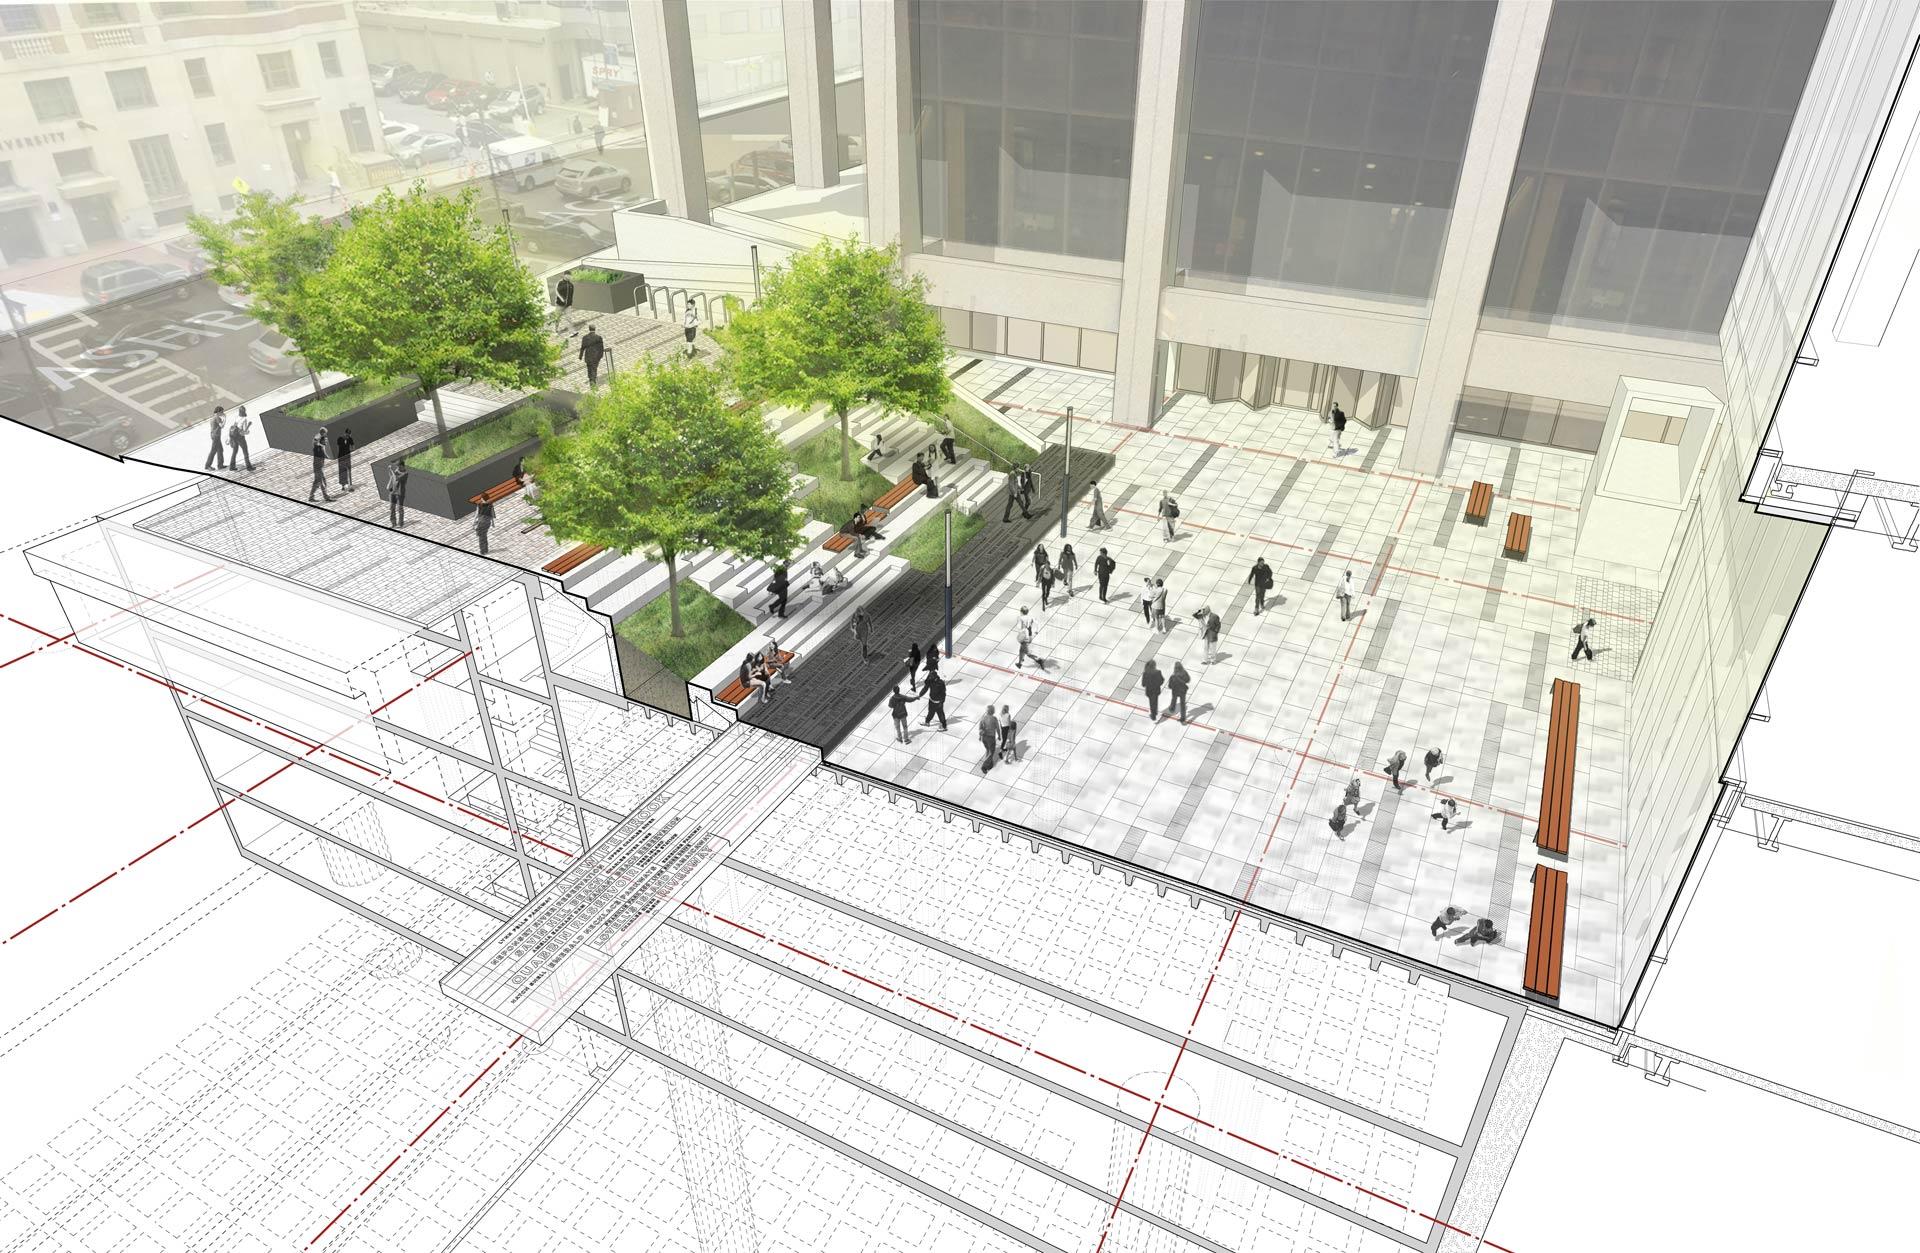 Roemer Plaza_Suffolk University_Landscape on structure diagram_Klopfer Martin.jpg